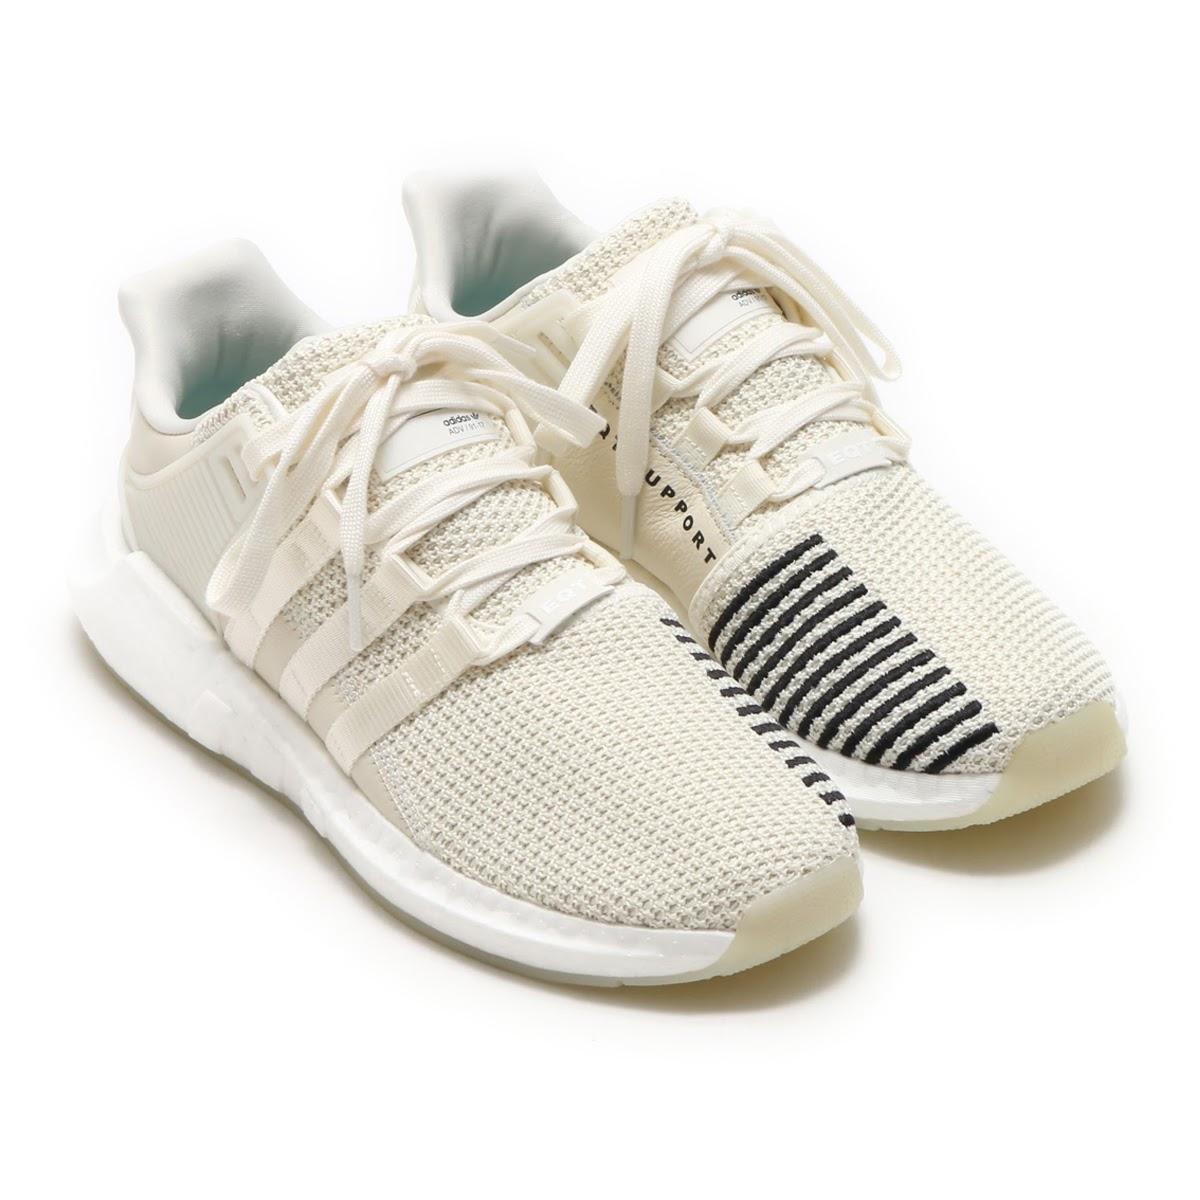 adidas Originals EQT SUPPORT 93/17 (アディダス オリジナルス EQT サポート 93/17) Off White/Off White/Footwear WhiteOff White/Off White/Footwear White【メンズ スニーカー】17FW-S